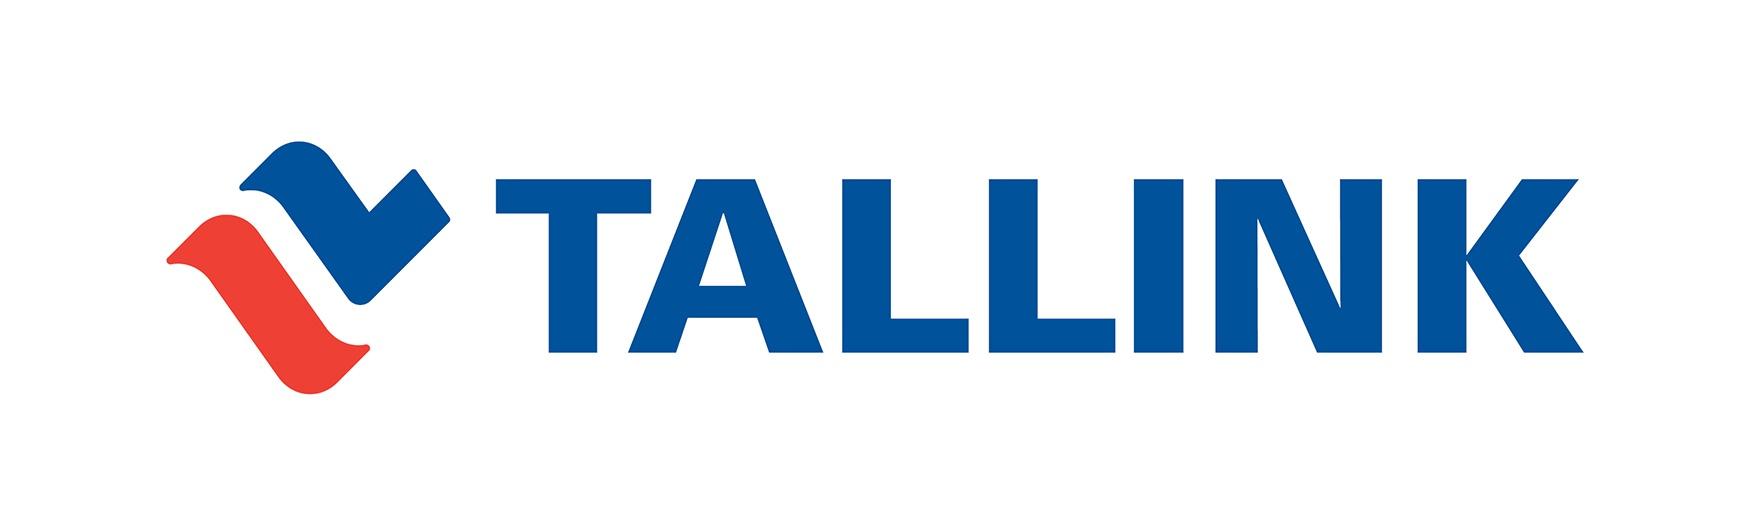 Tallink's_logo.jpg